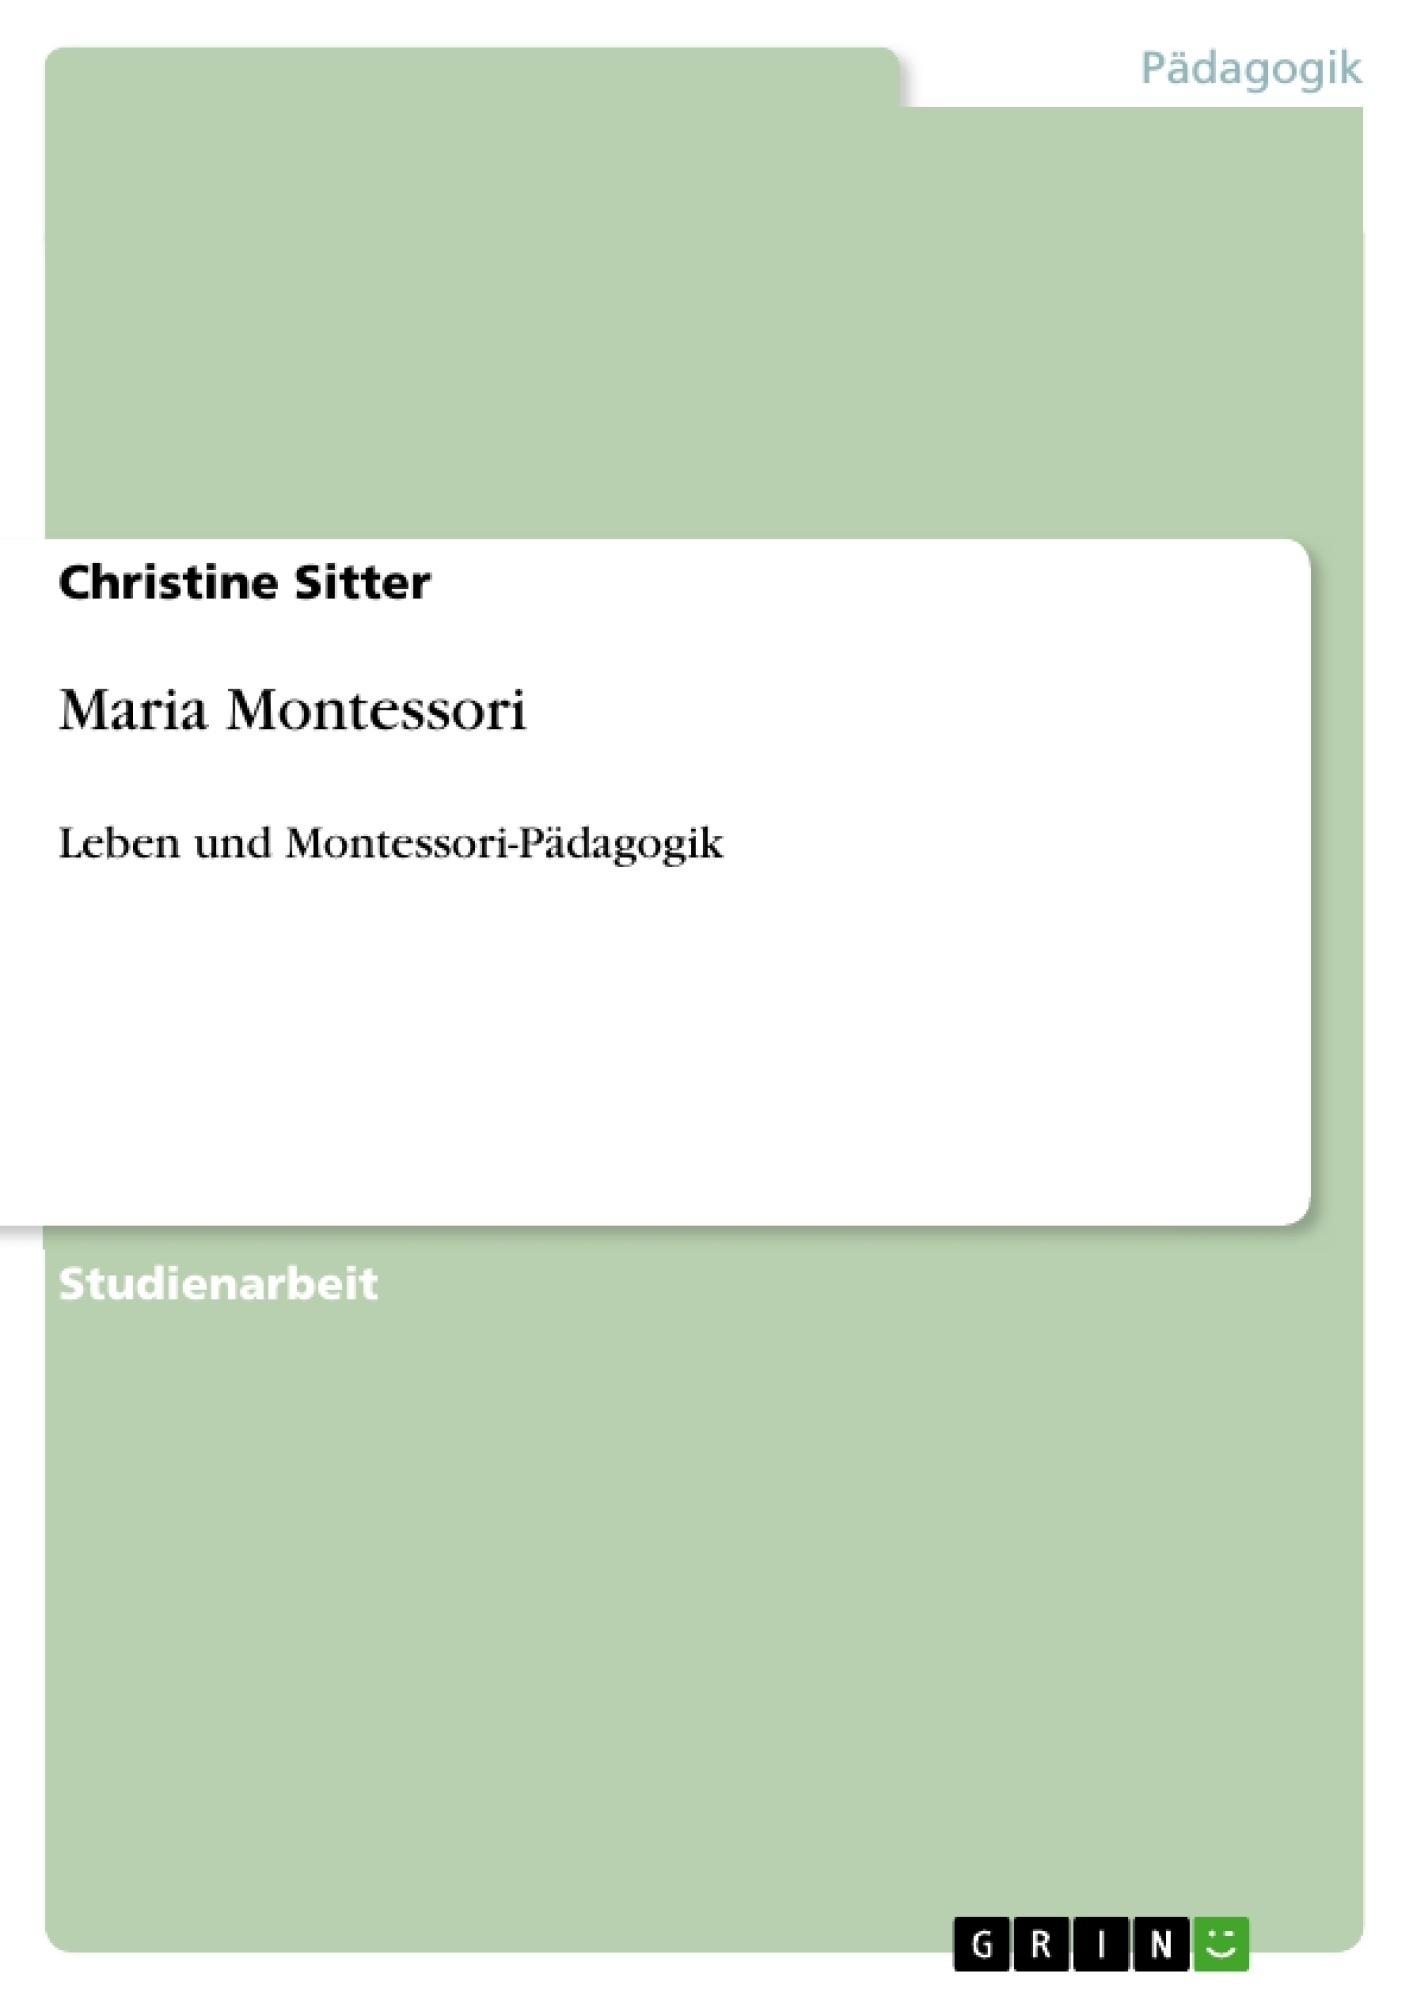 Titel: Maria Montessori